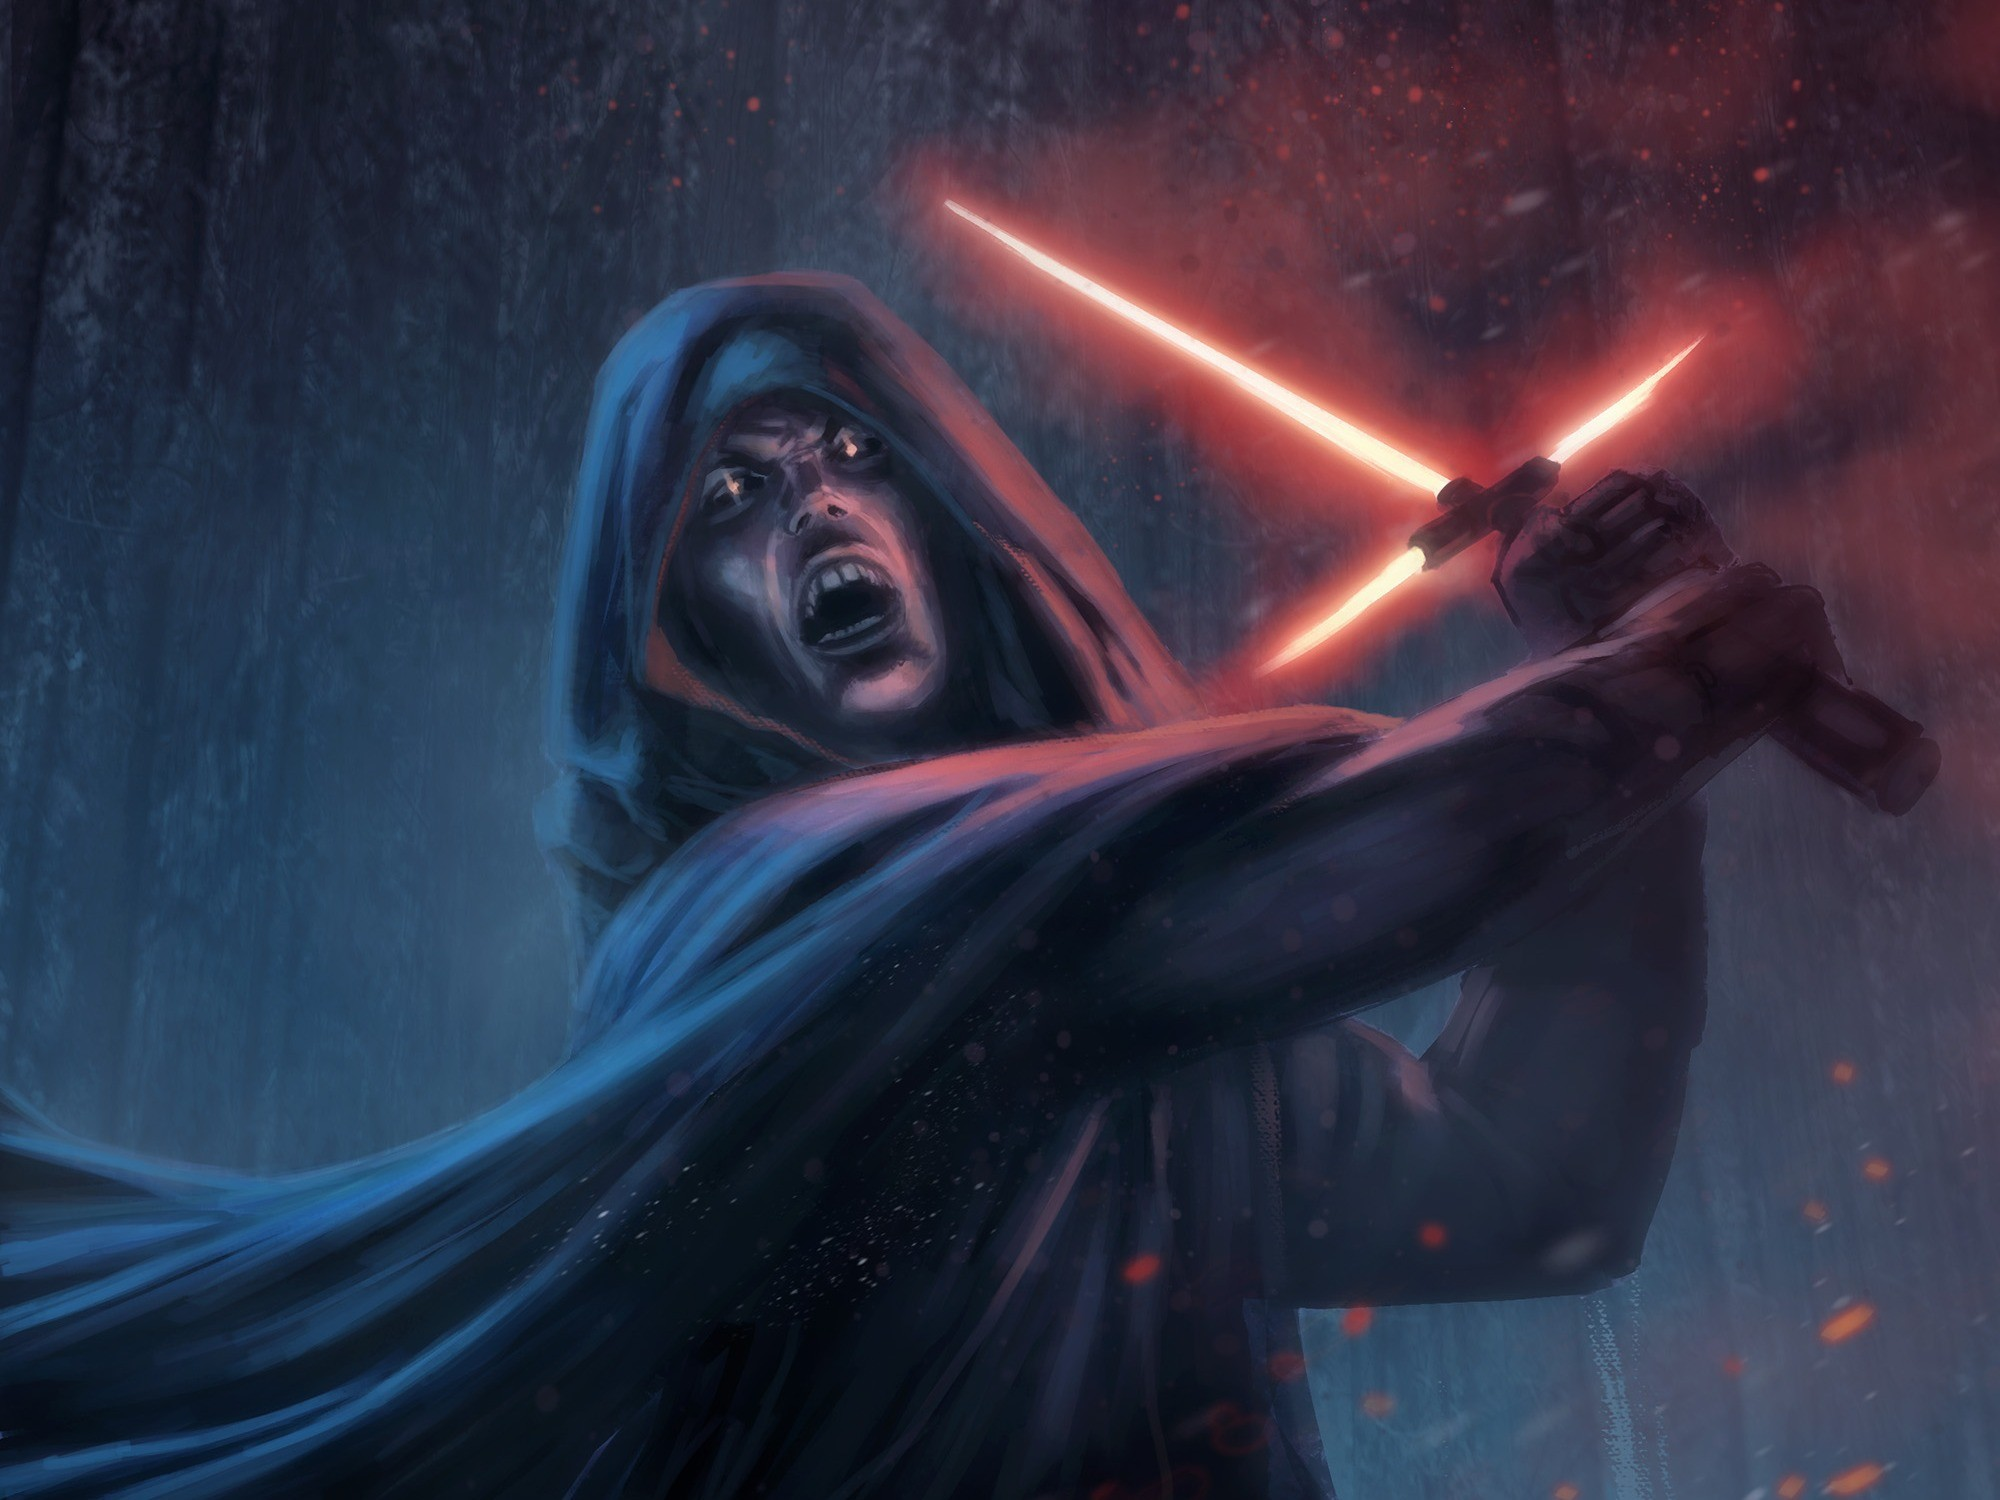 Wallpaper star wars episode vii – the force awakens, sith,  lightsaber